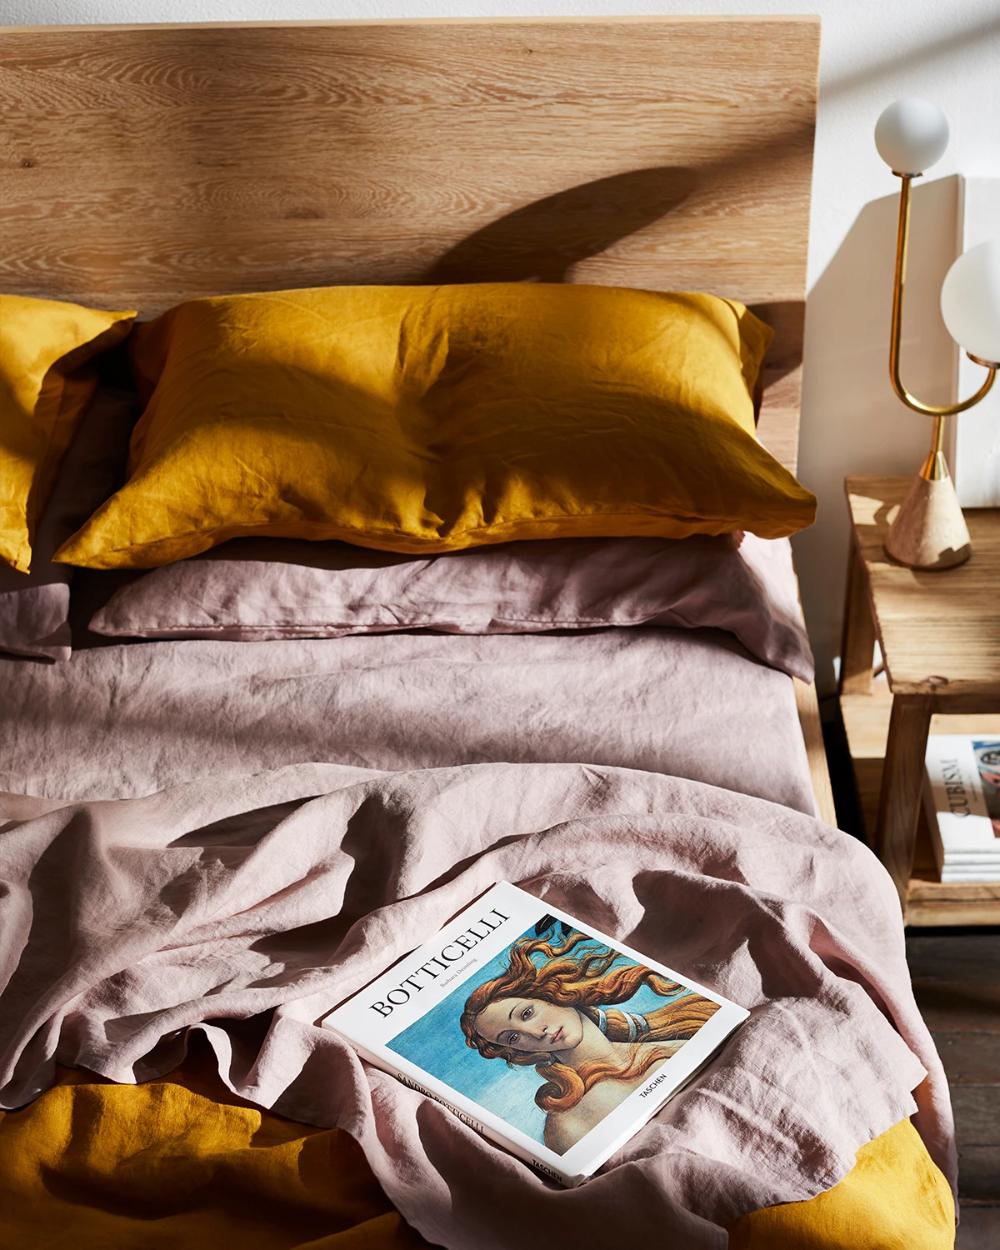 Gift Guide Bed Linen Sets Linen Bed Sheets Linen Bedding